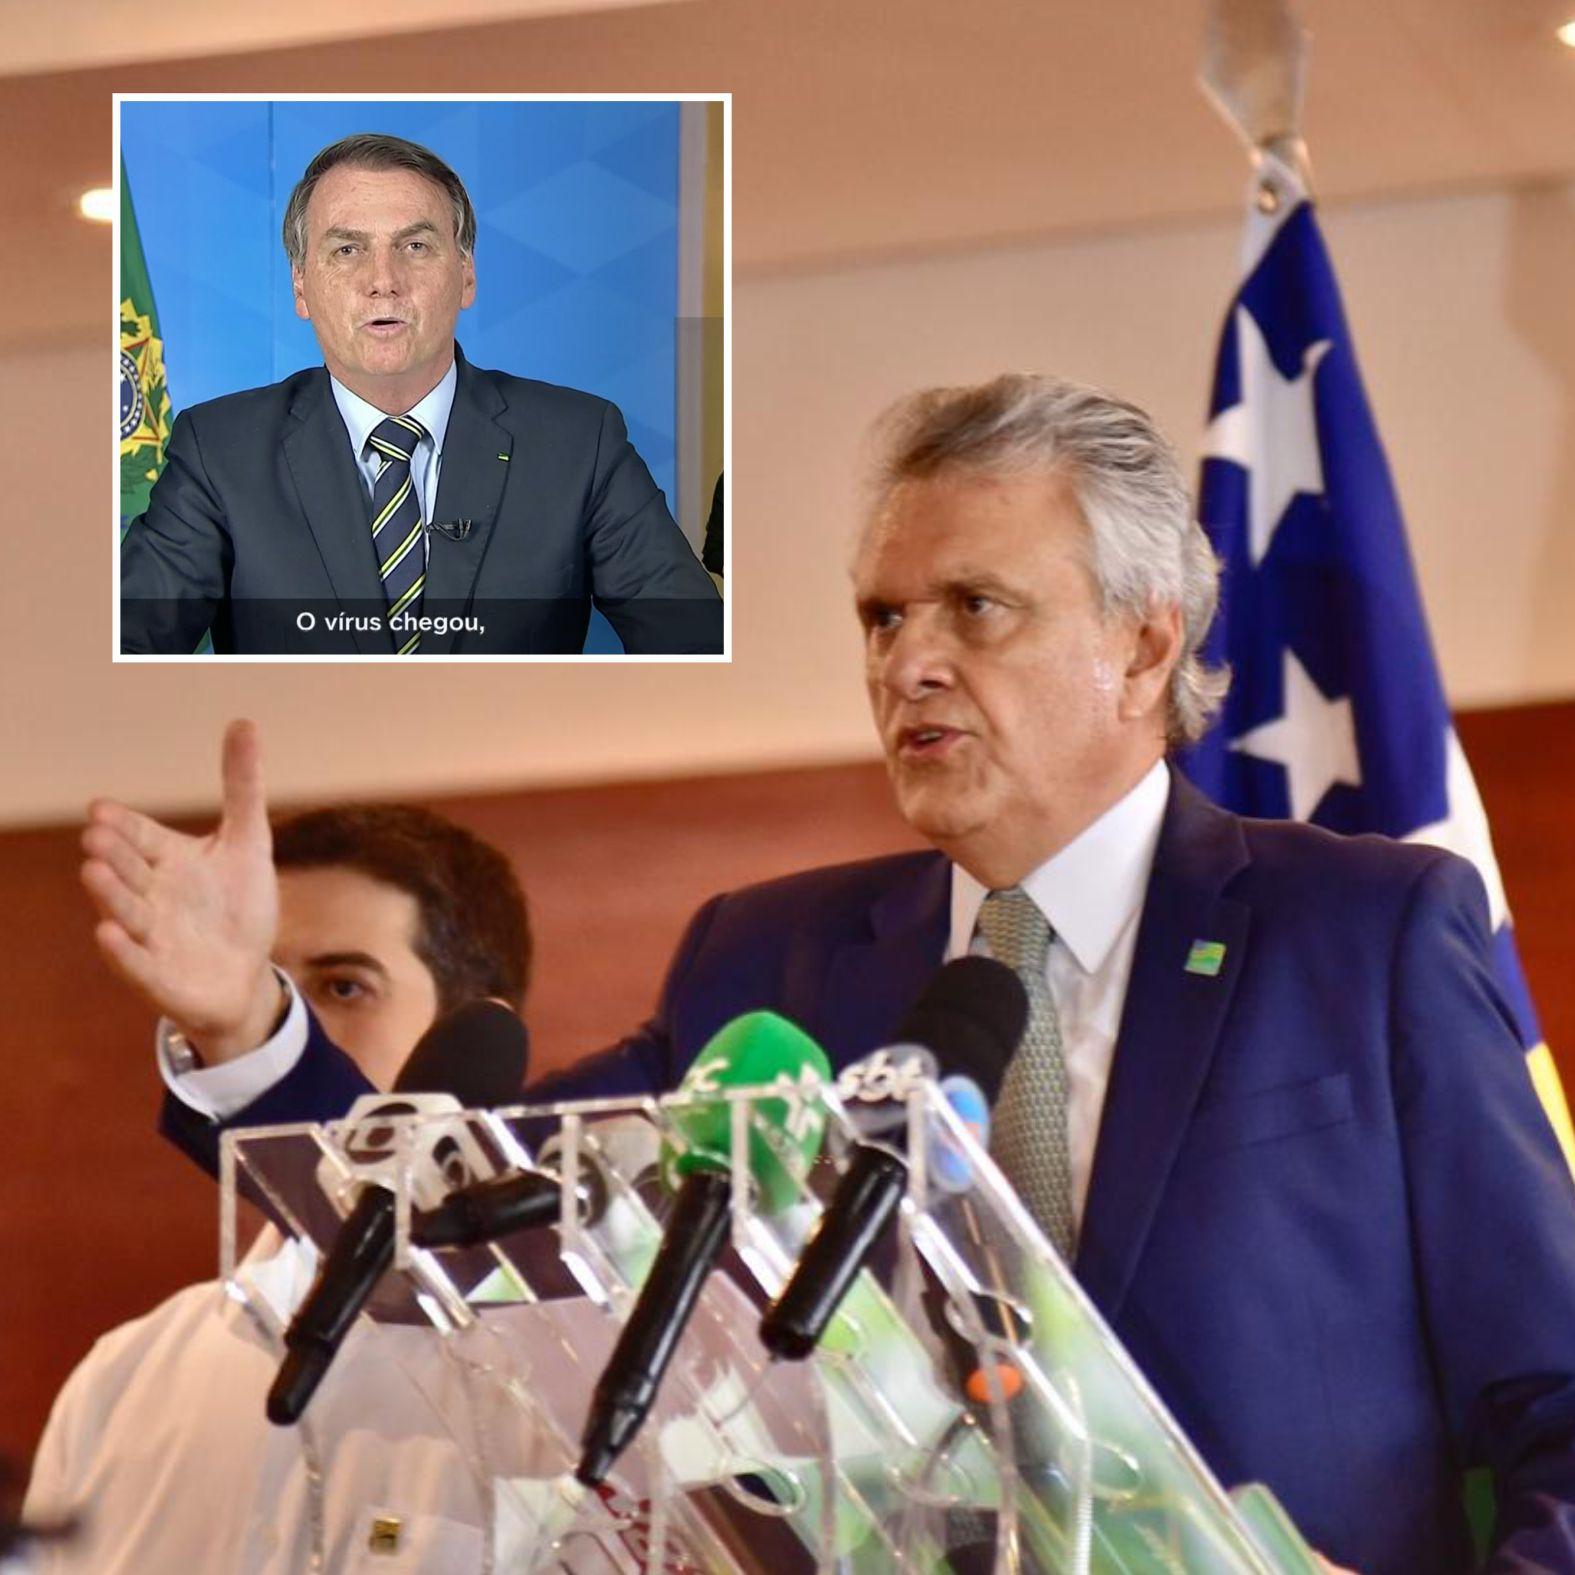 Após pronunciamento, Caiado afasta-se de Bolsonaro